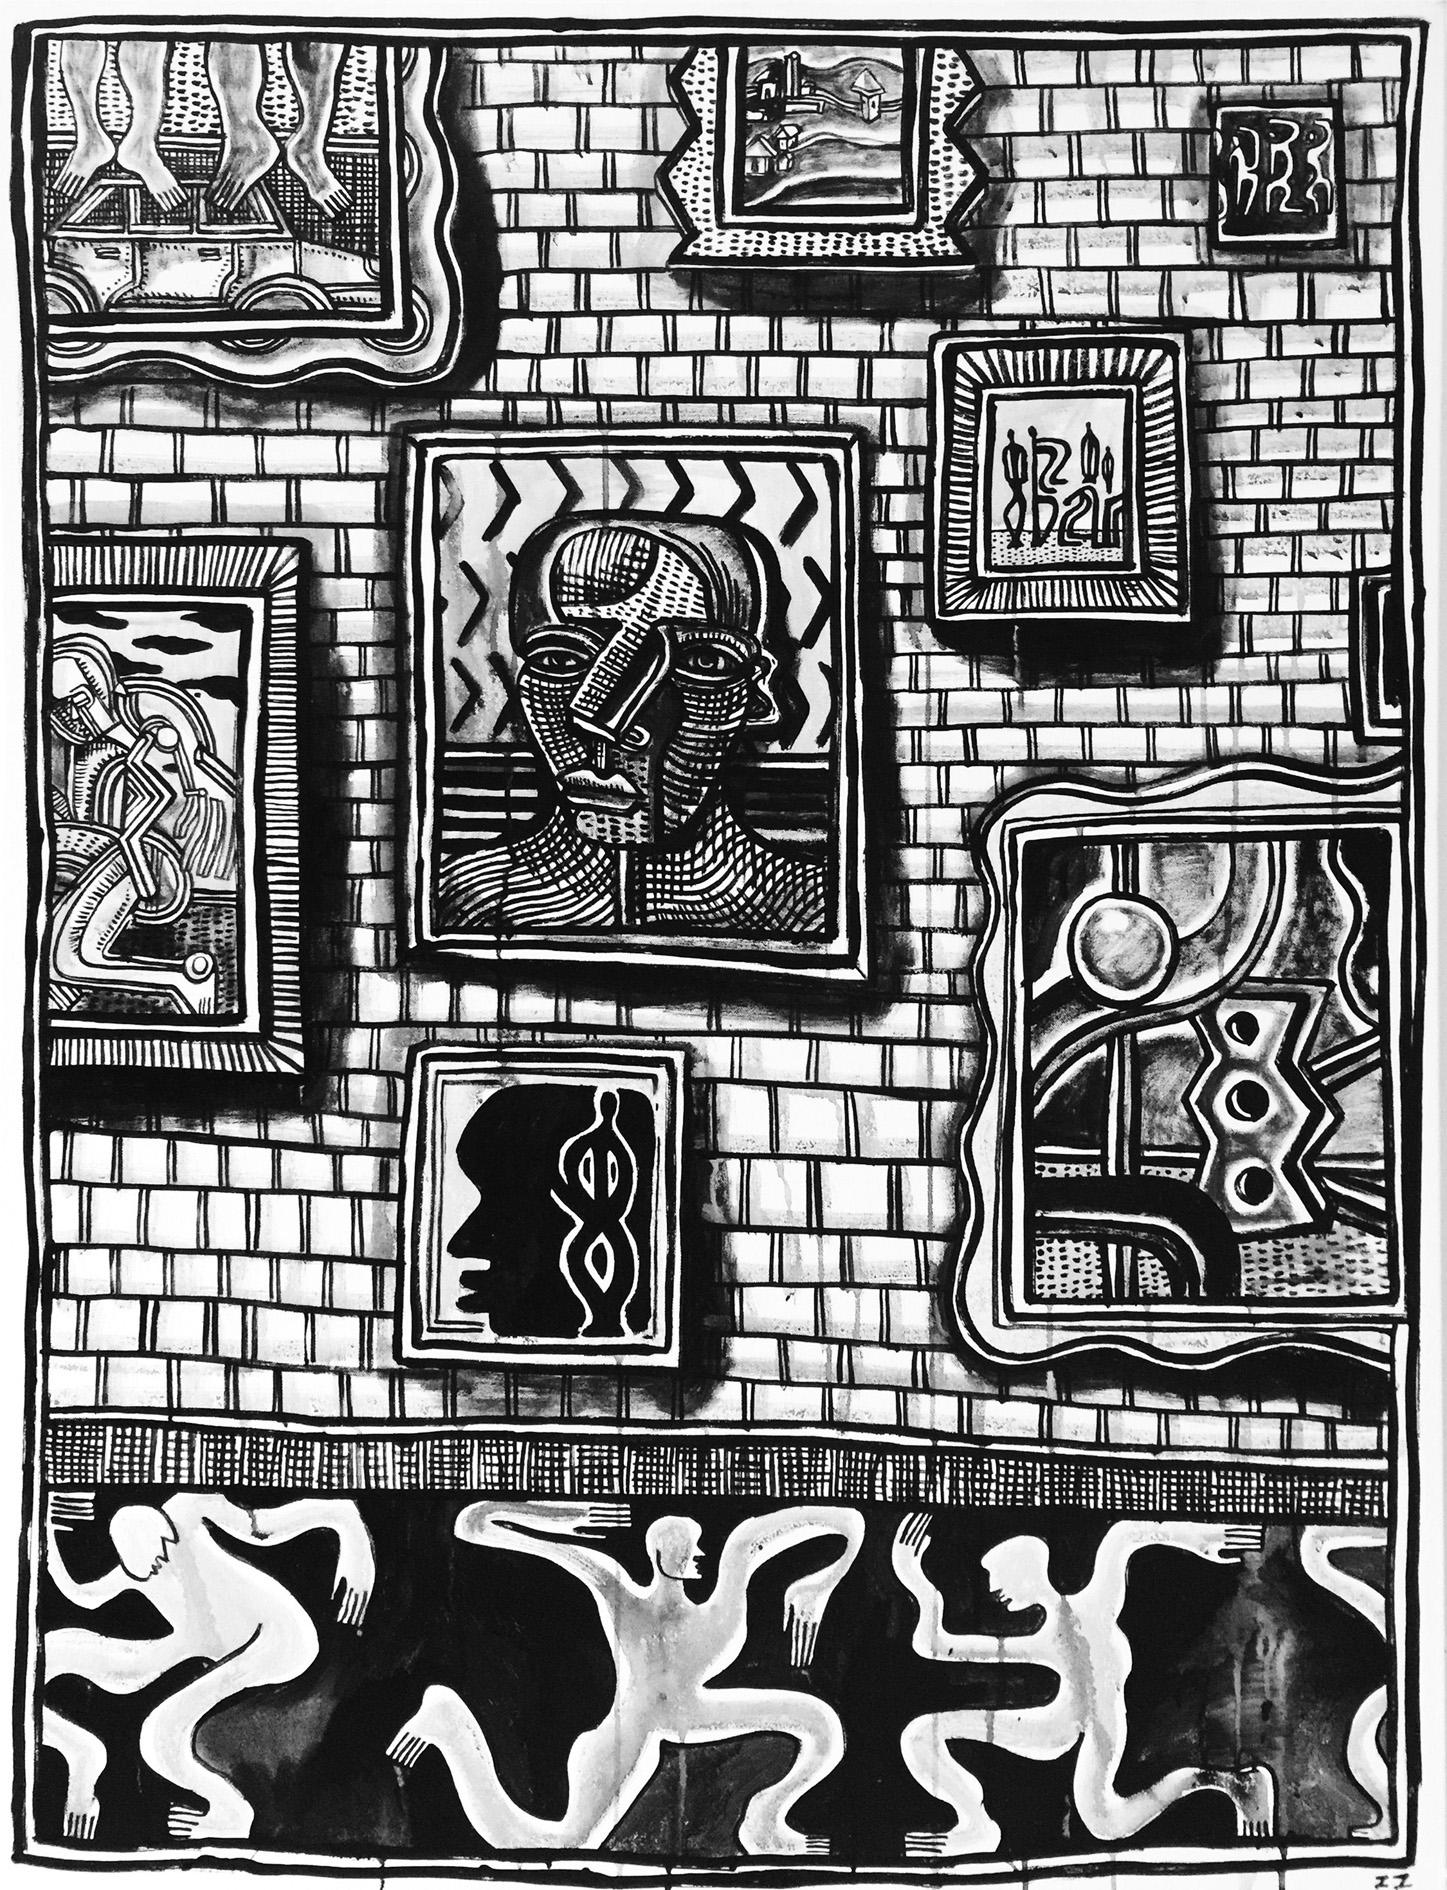 10-bis-zio-zieglerthe-weight-of-art-history-2015-acrilico-su-tela-cm122x91